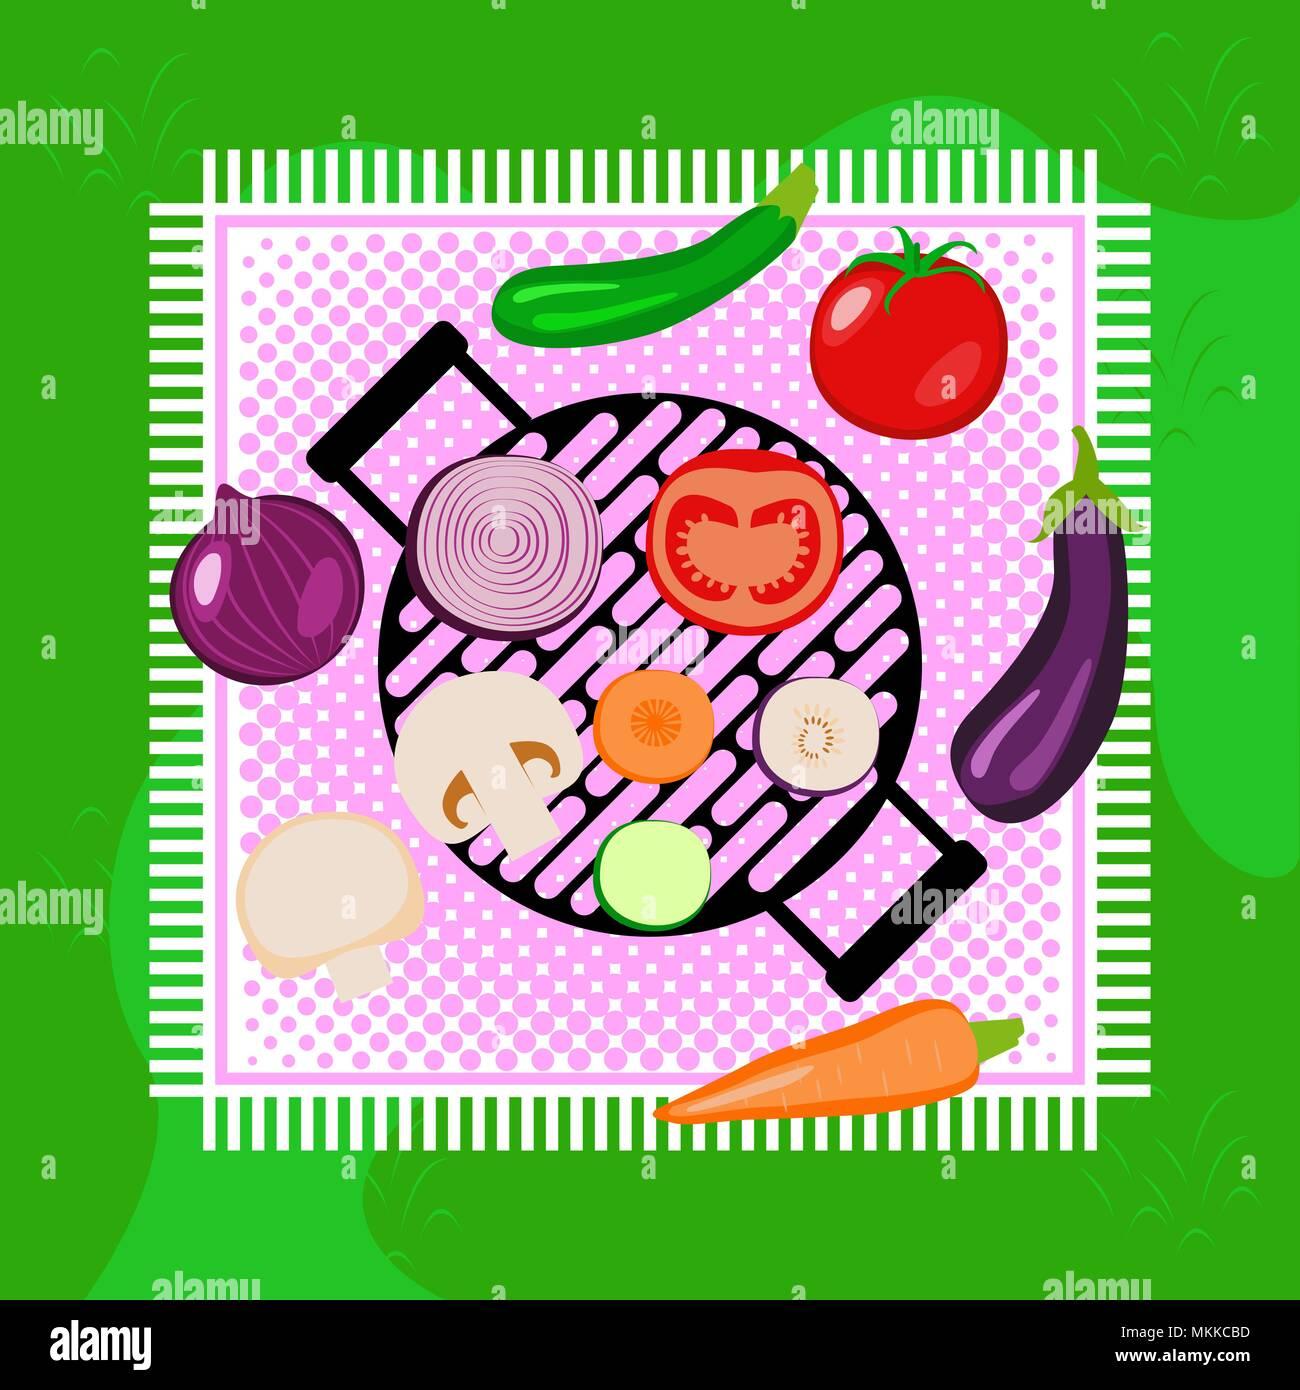 Dorable Colorear Al Aire Libre Composición - Ideas Para Colorear ...